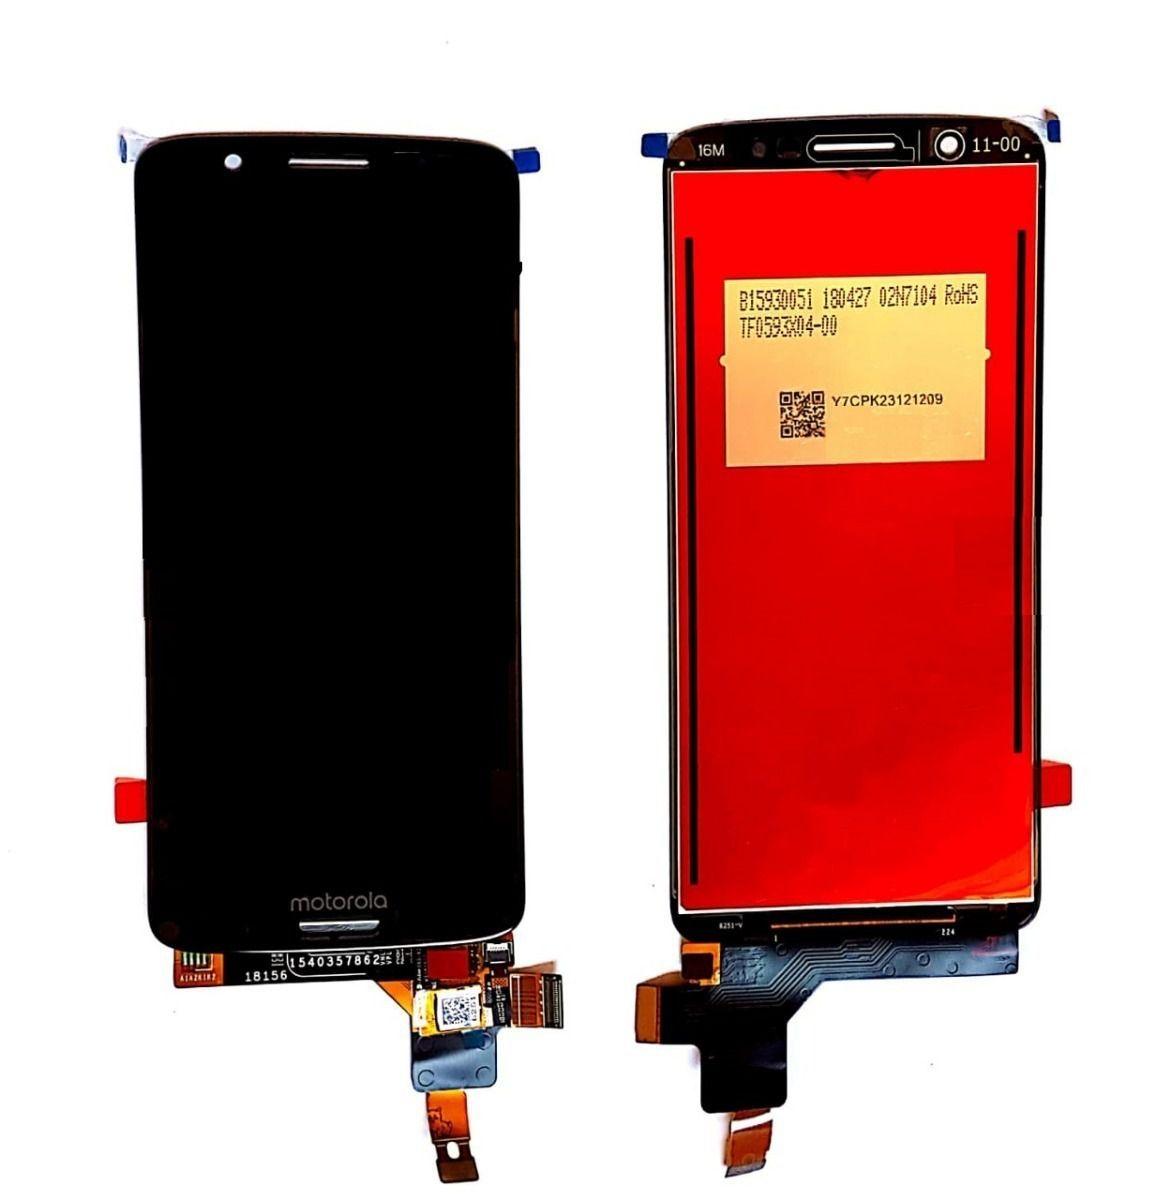 Frontal Tela Touch Display Motorola Moto G6 Plus / MotoG6 plus Xt1926 Preto